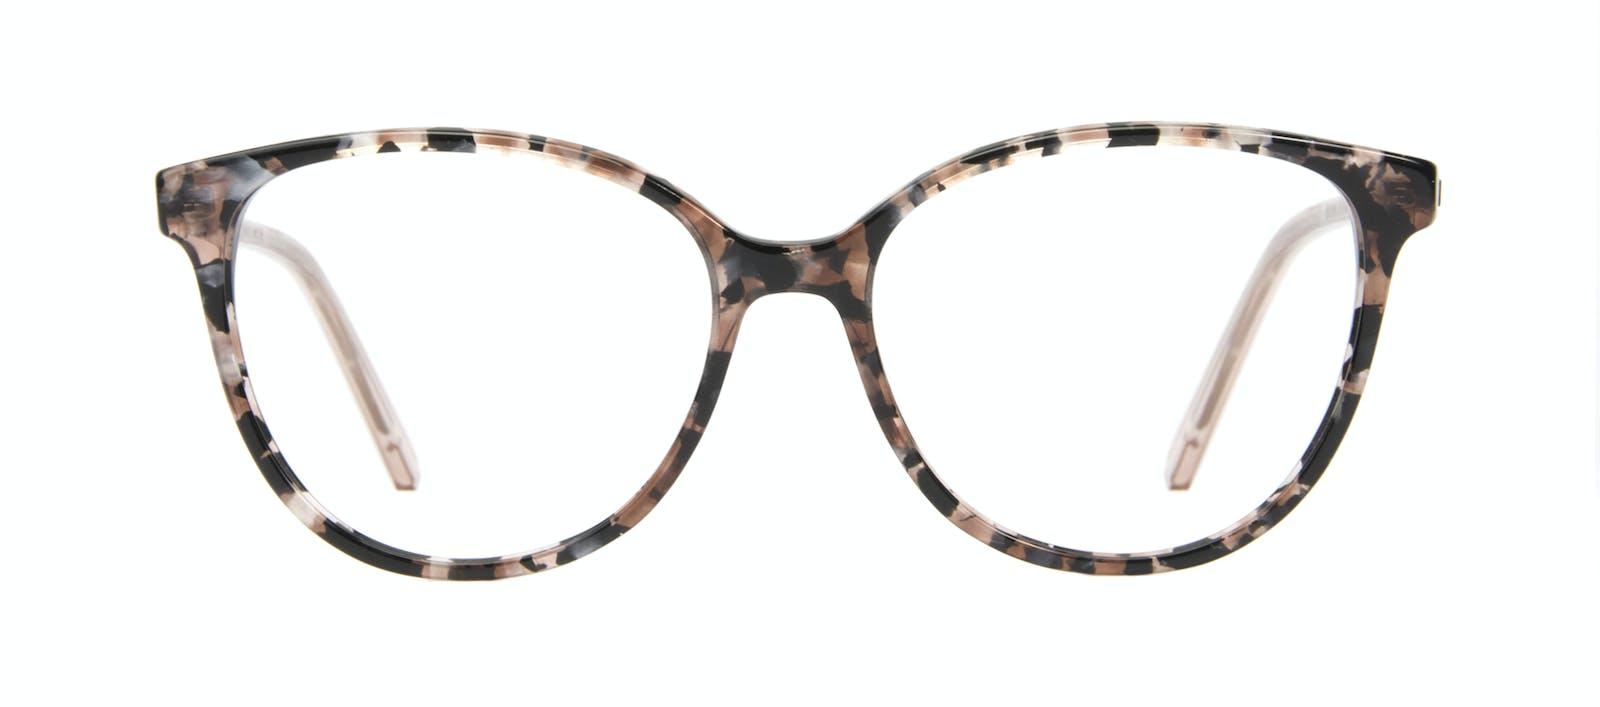 41cbc3db3c9 Affordable Fashion Glasses Round Eyeglasses Women Imagine II Pink Tortoise  Front